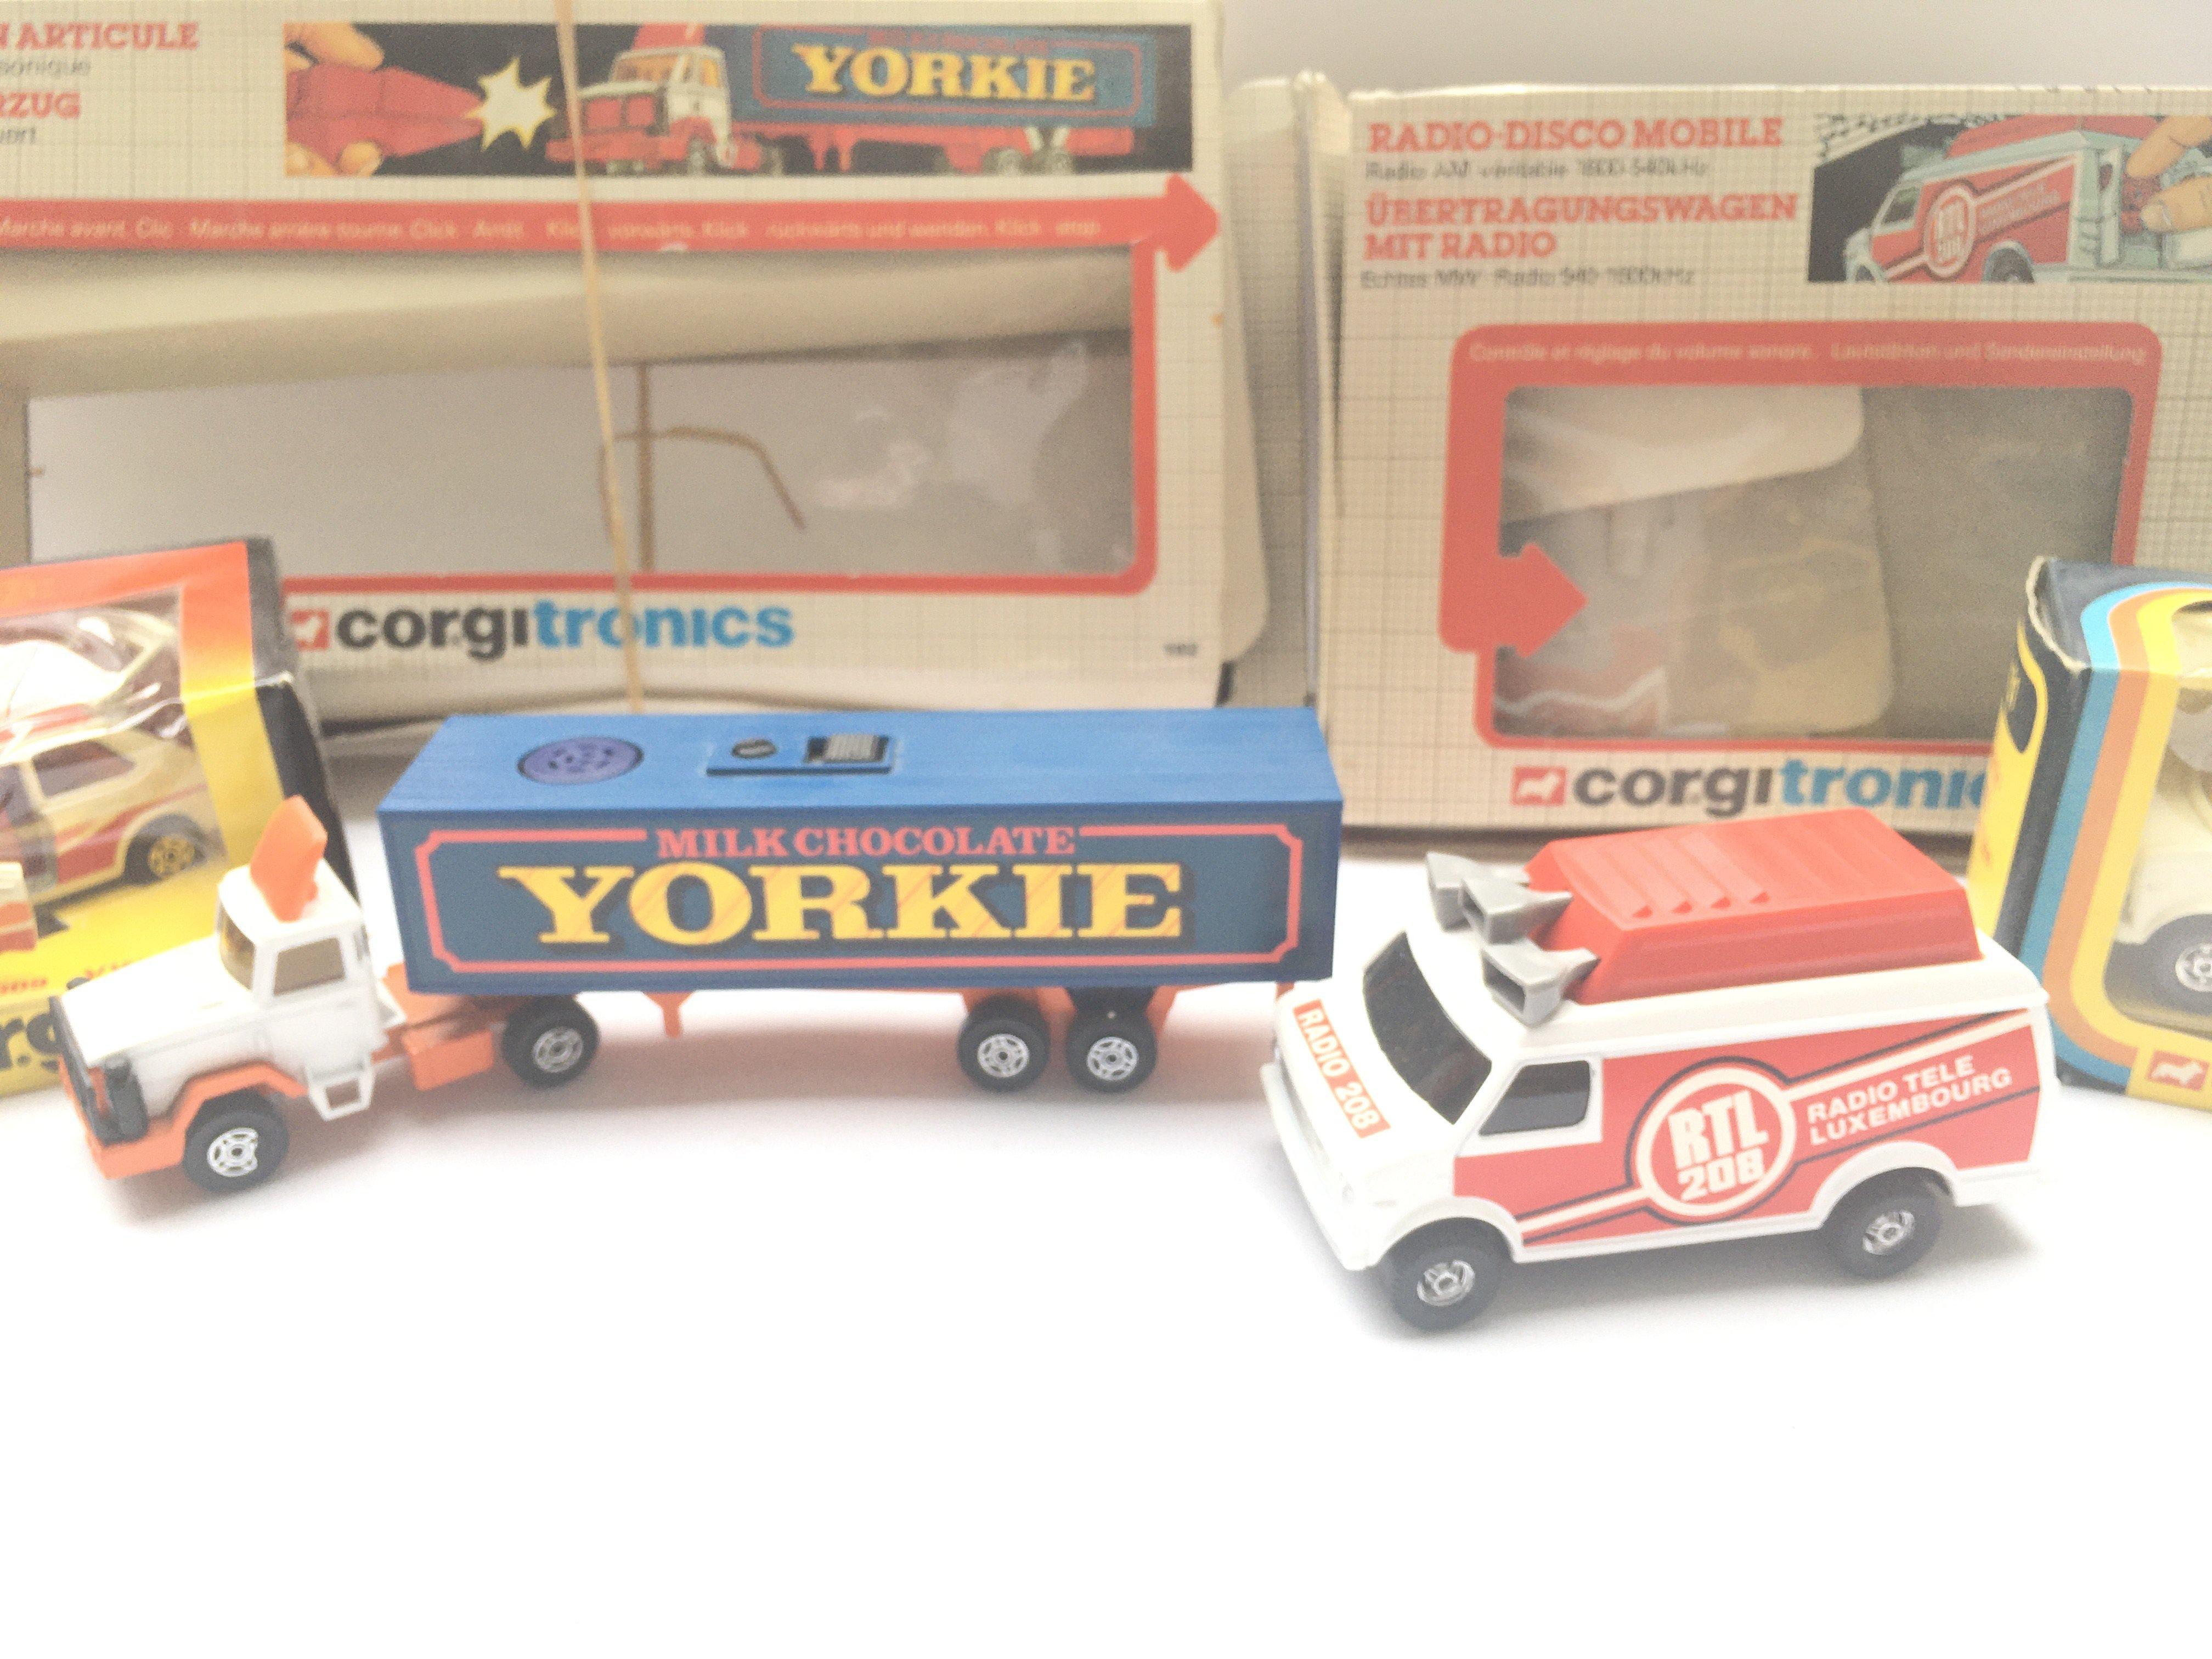 2 x Corgitronic Vehicles #1002 (control missing) a - Image 4 of 4